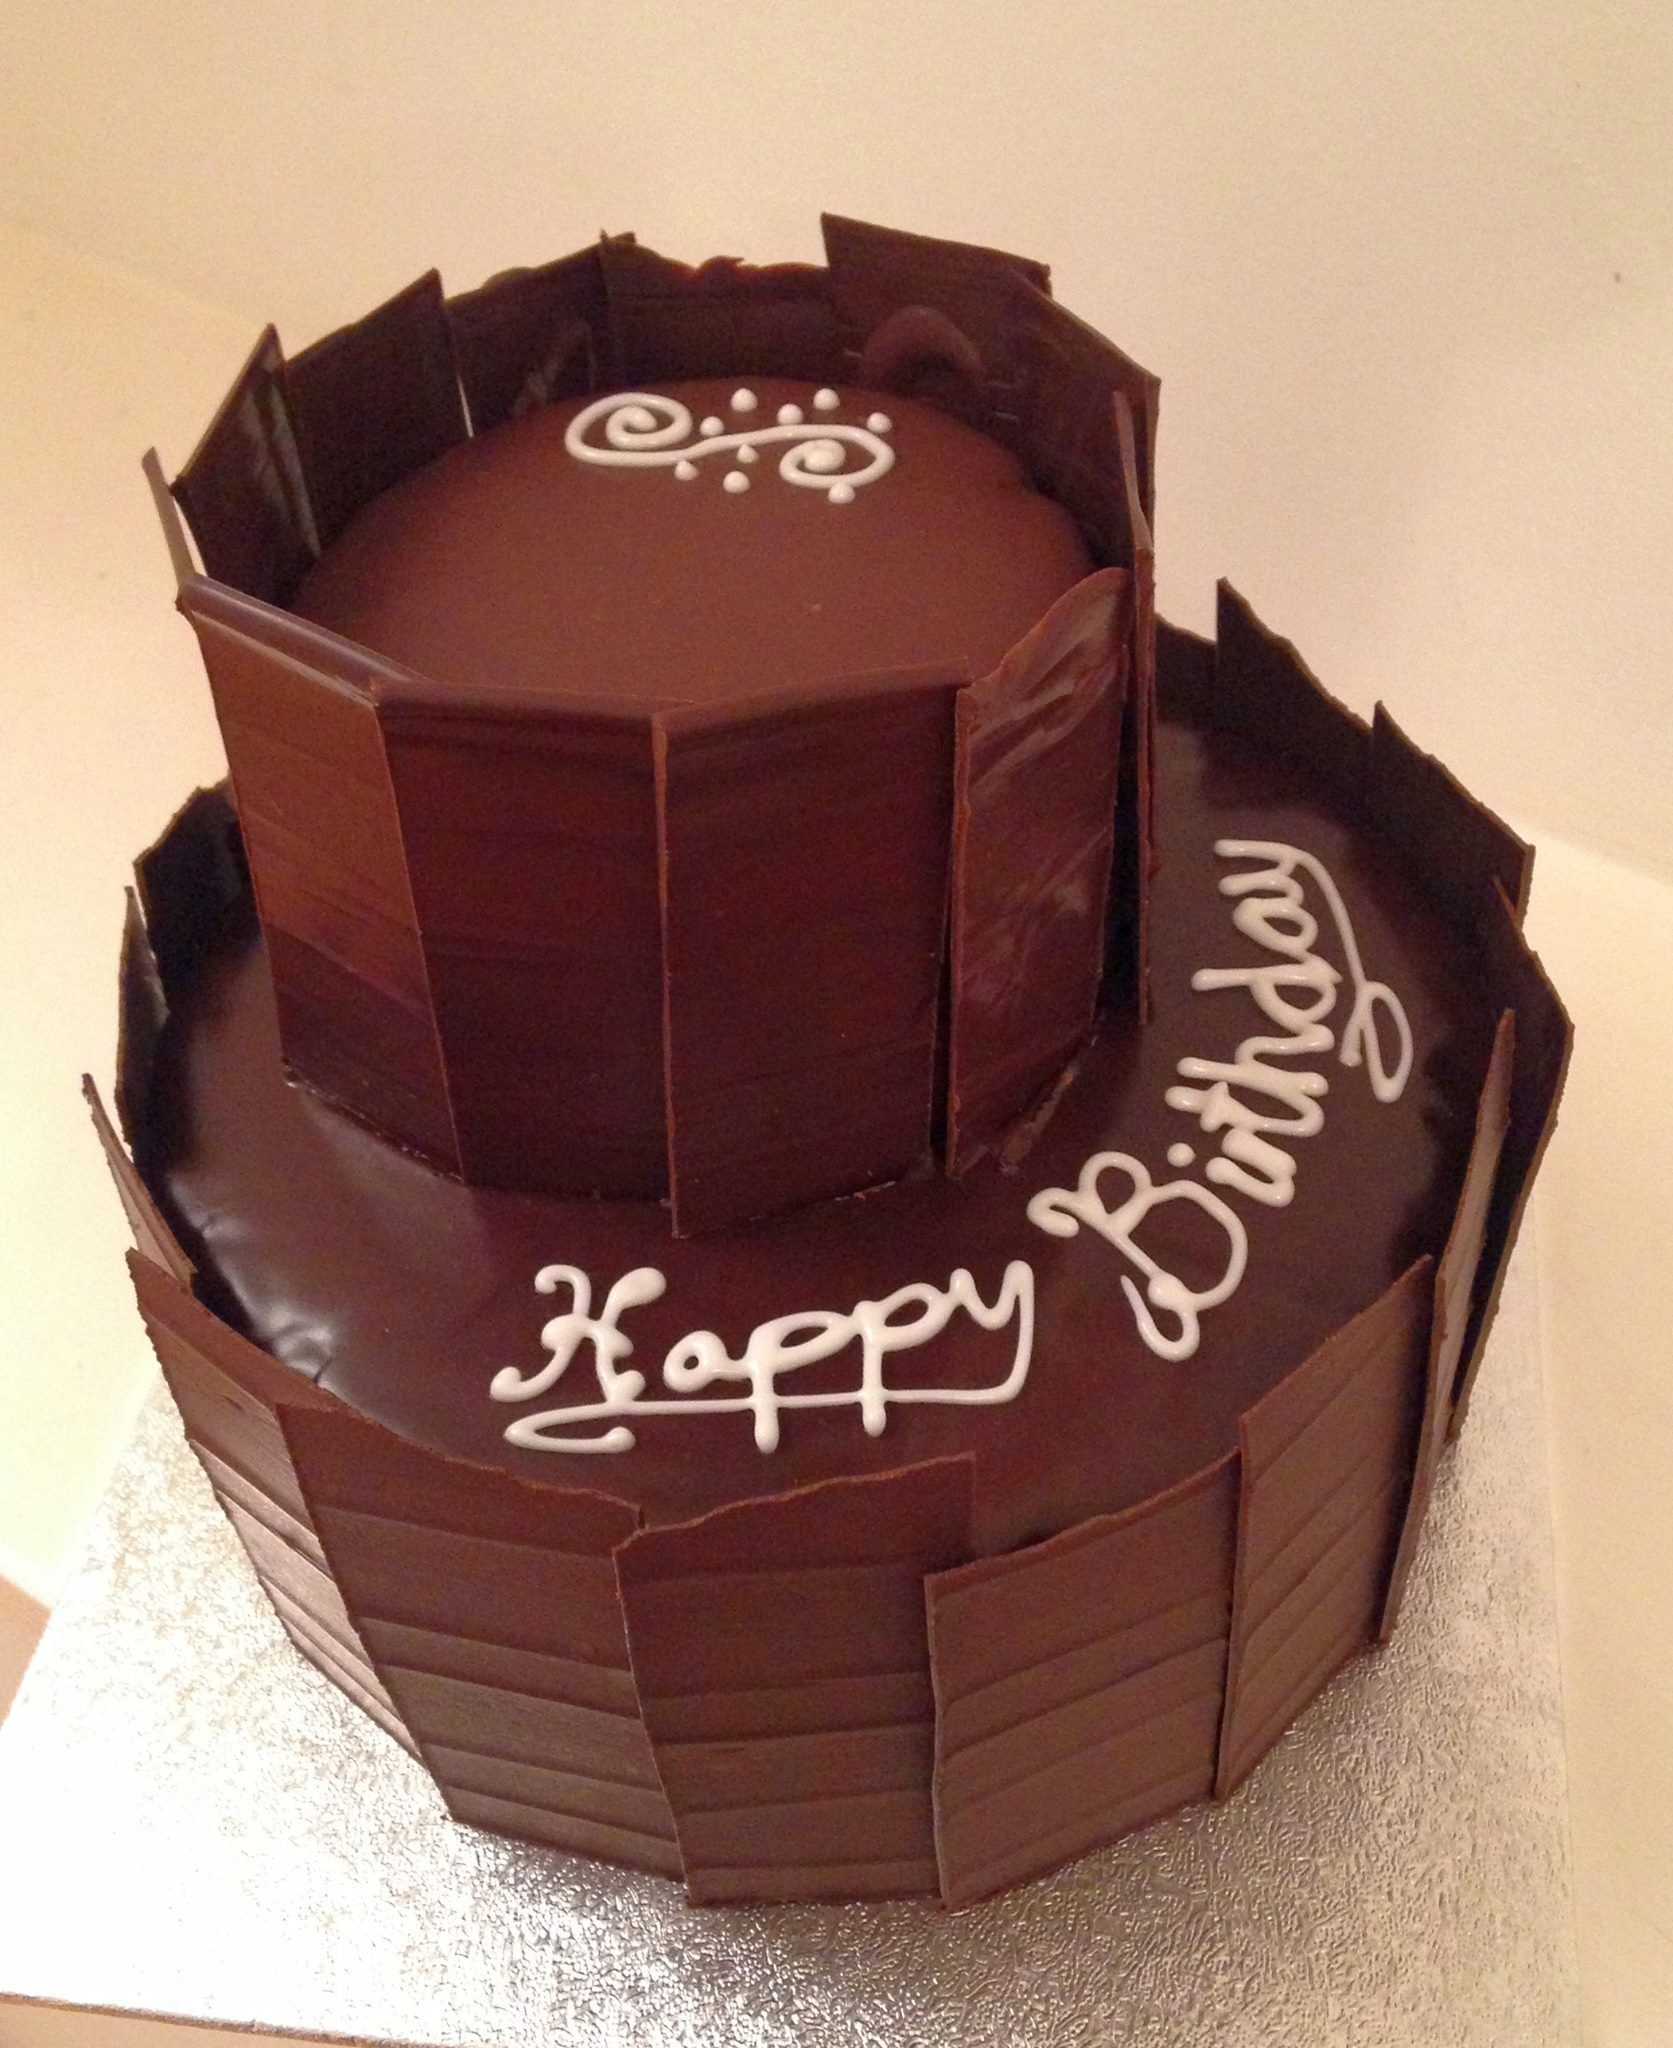 2 Tier Sacher Torte - Birthday cake | Baking Moments